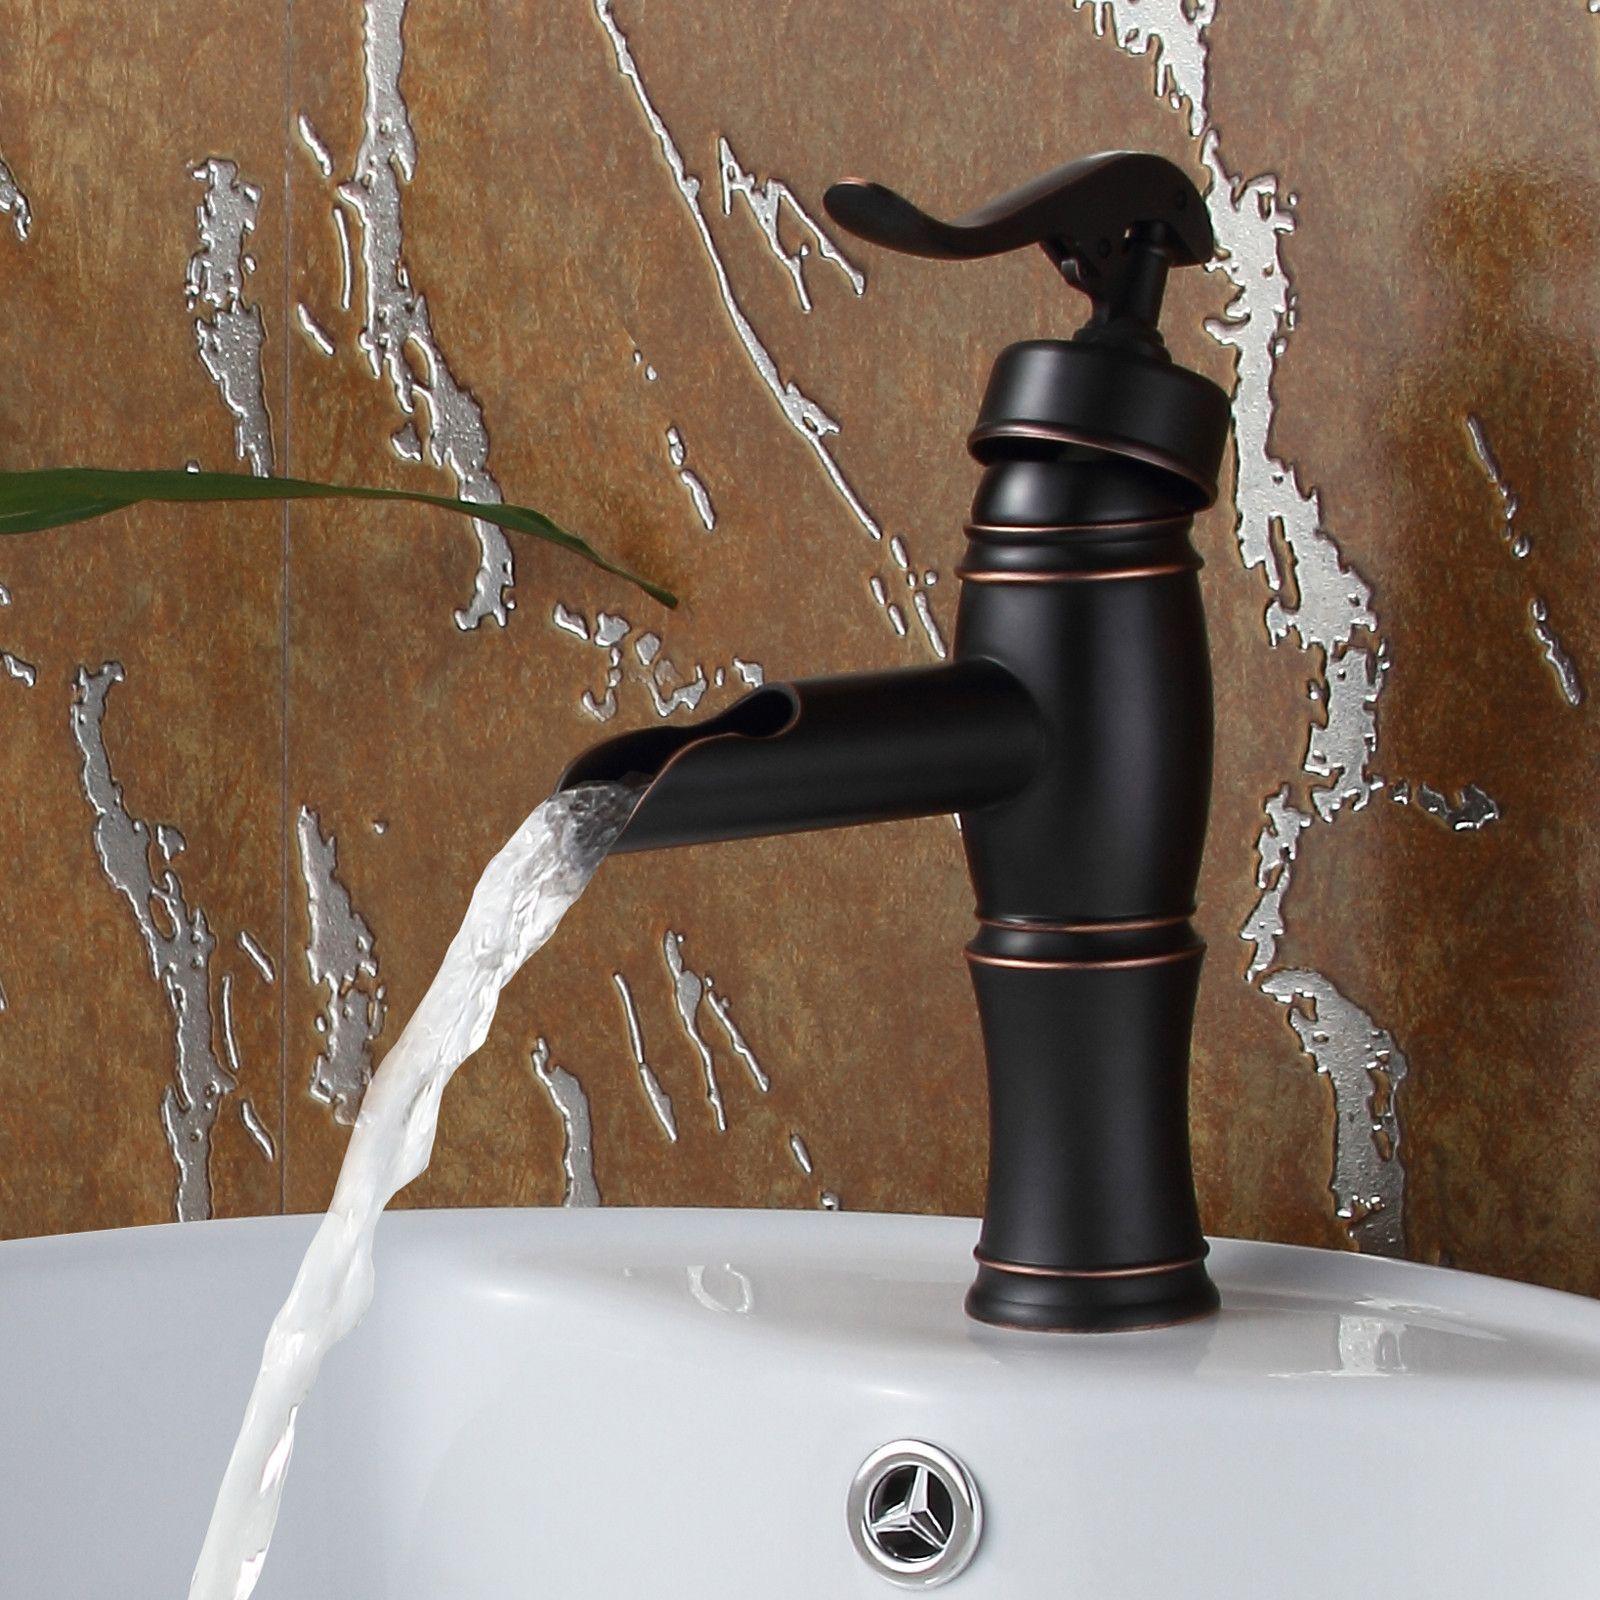 Vintage Bathroom Water Pump Faucet Bathroom Faucets Sink